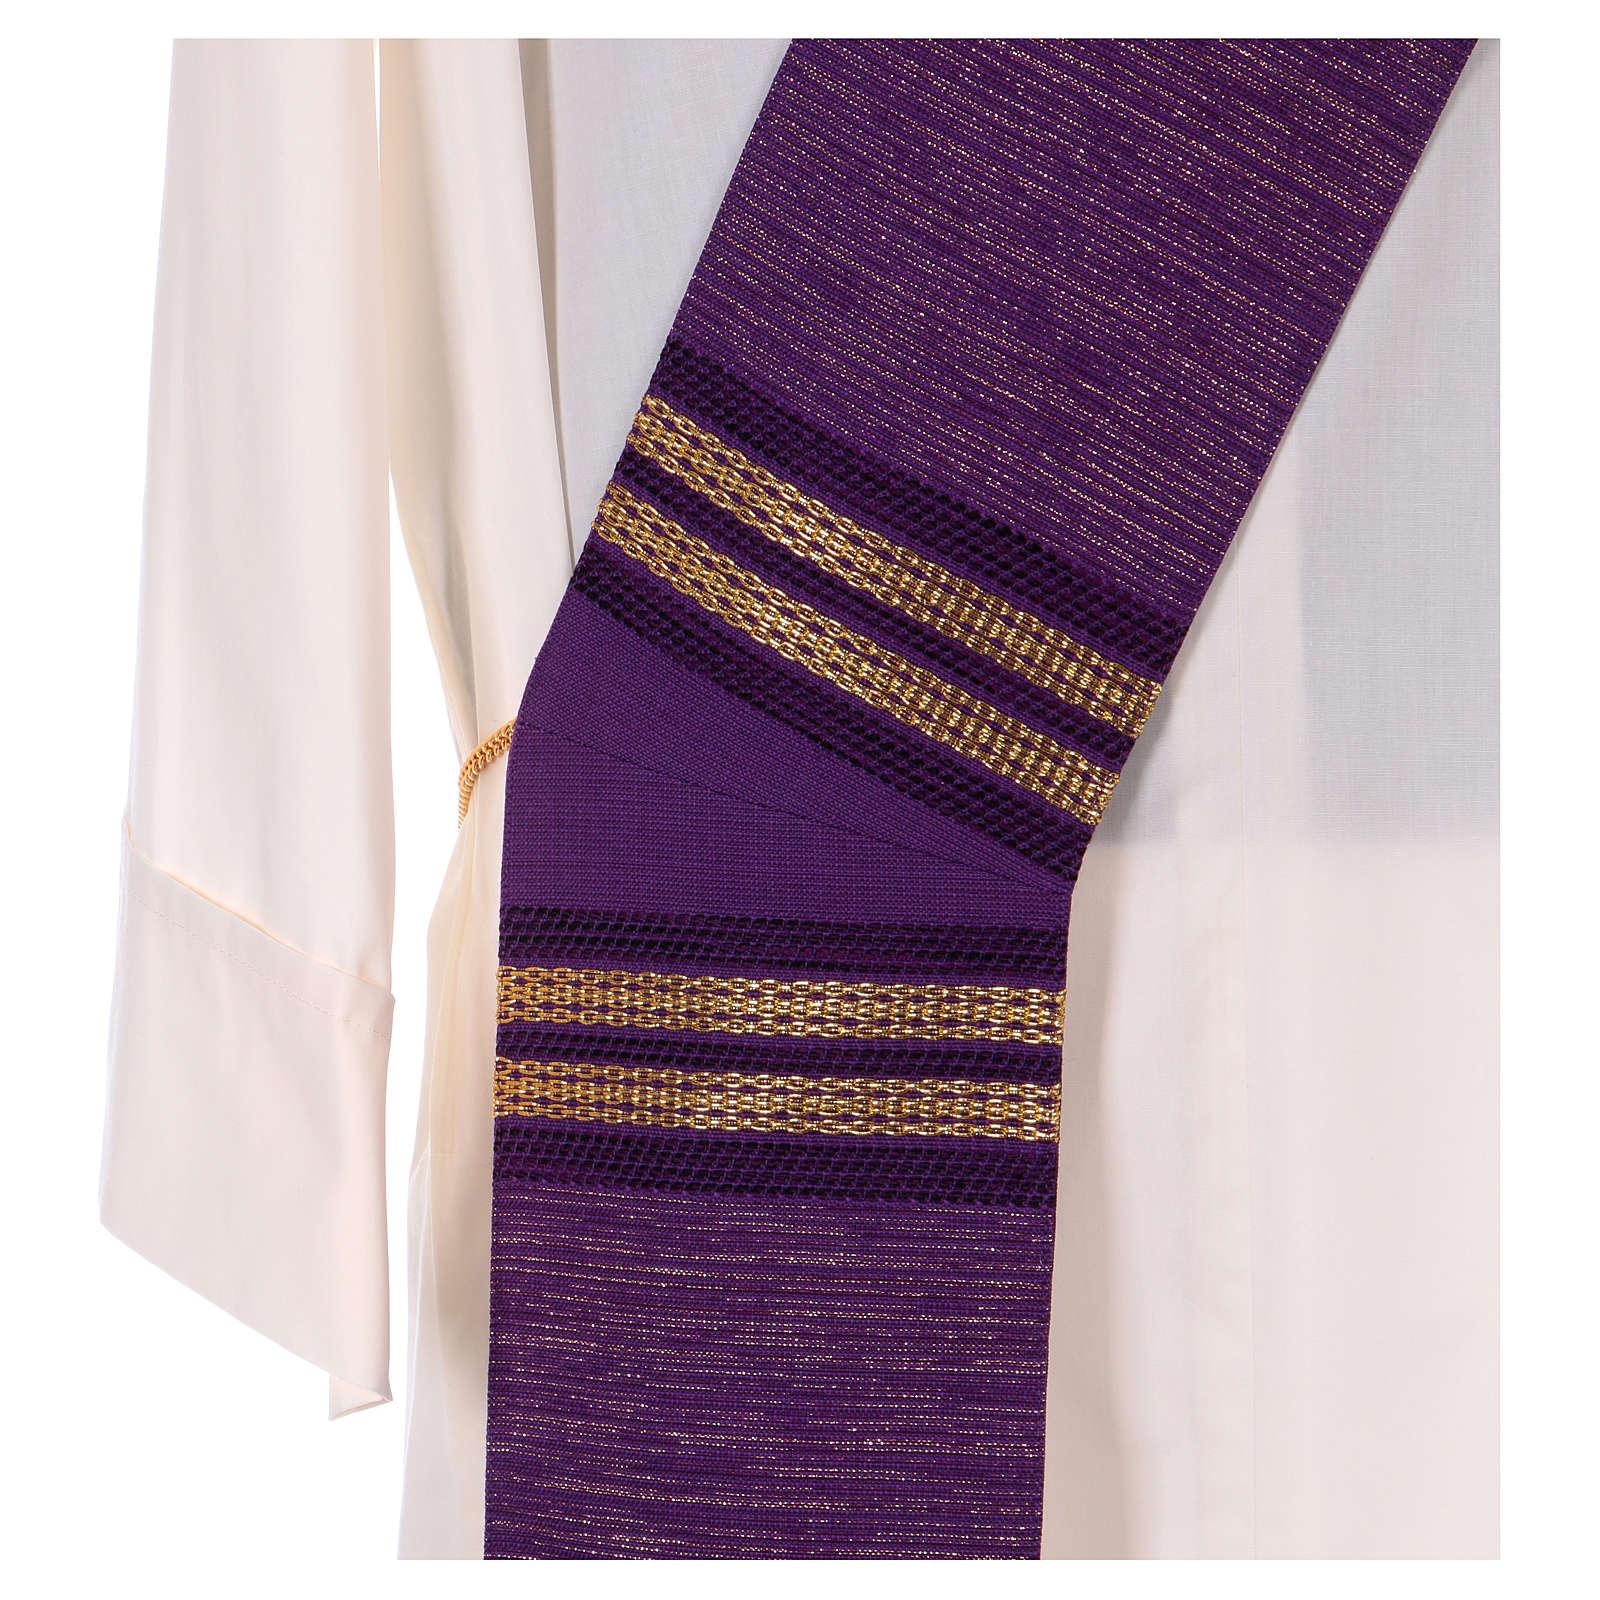 Estola 64% lana 26% acrilico 10% lurex cadenas doradas 4